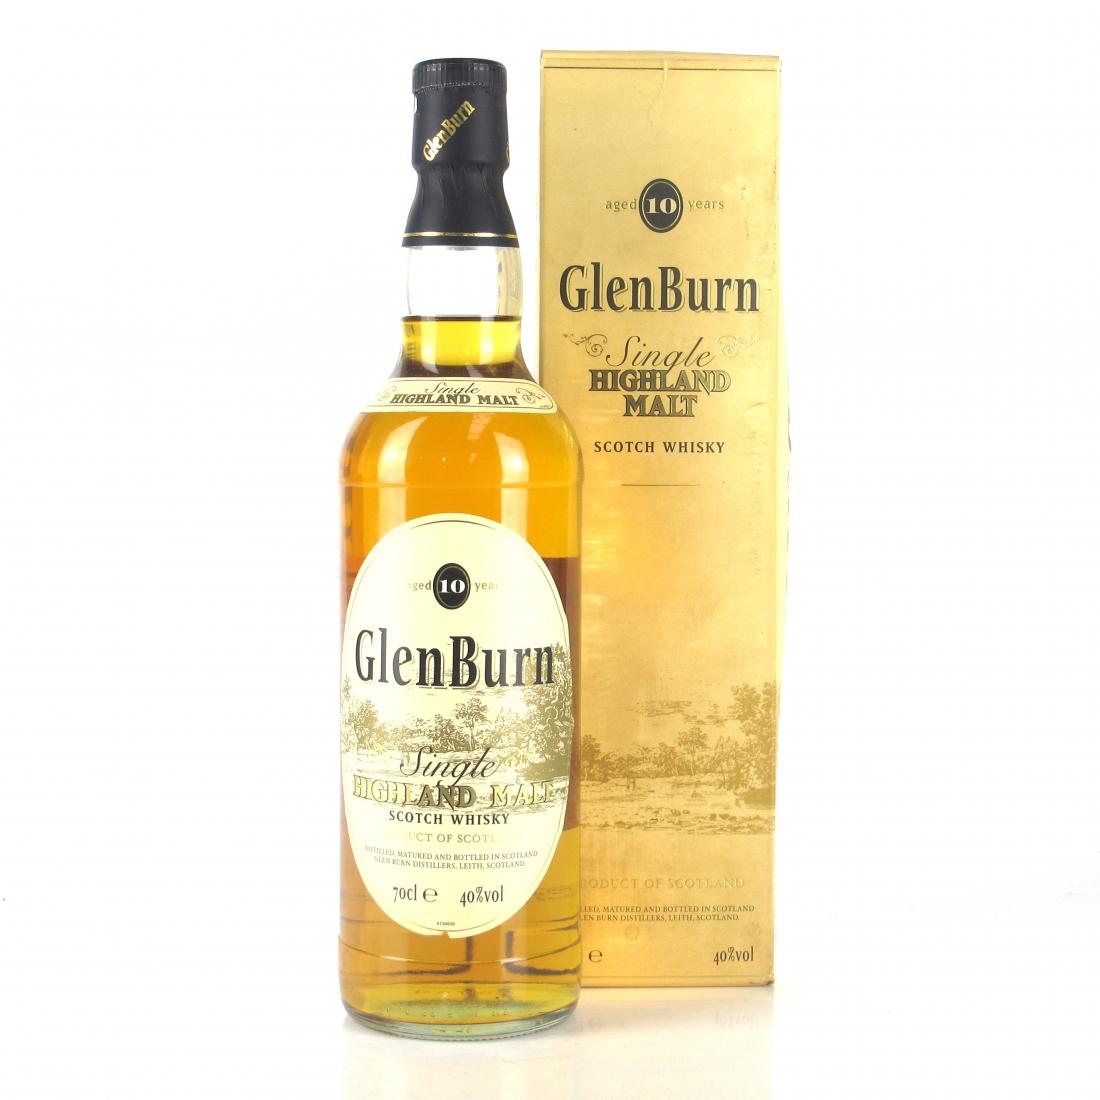 Glen Burn 10 Year Old